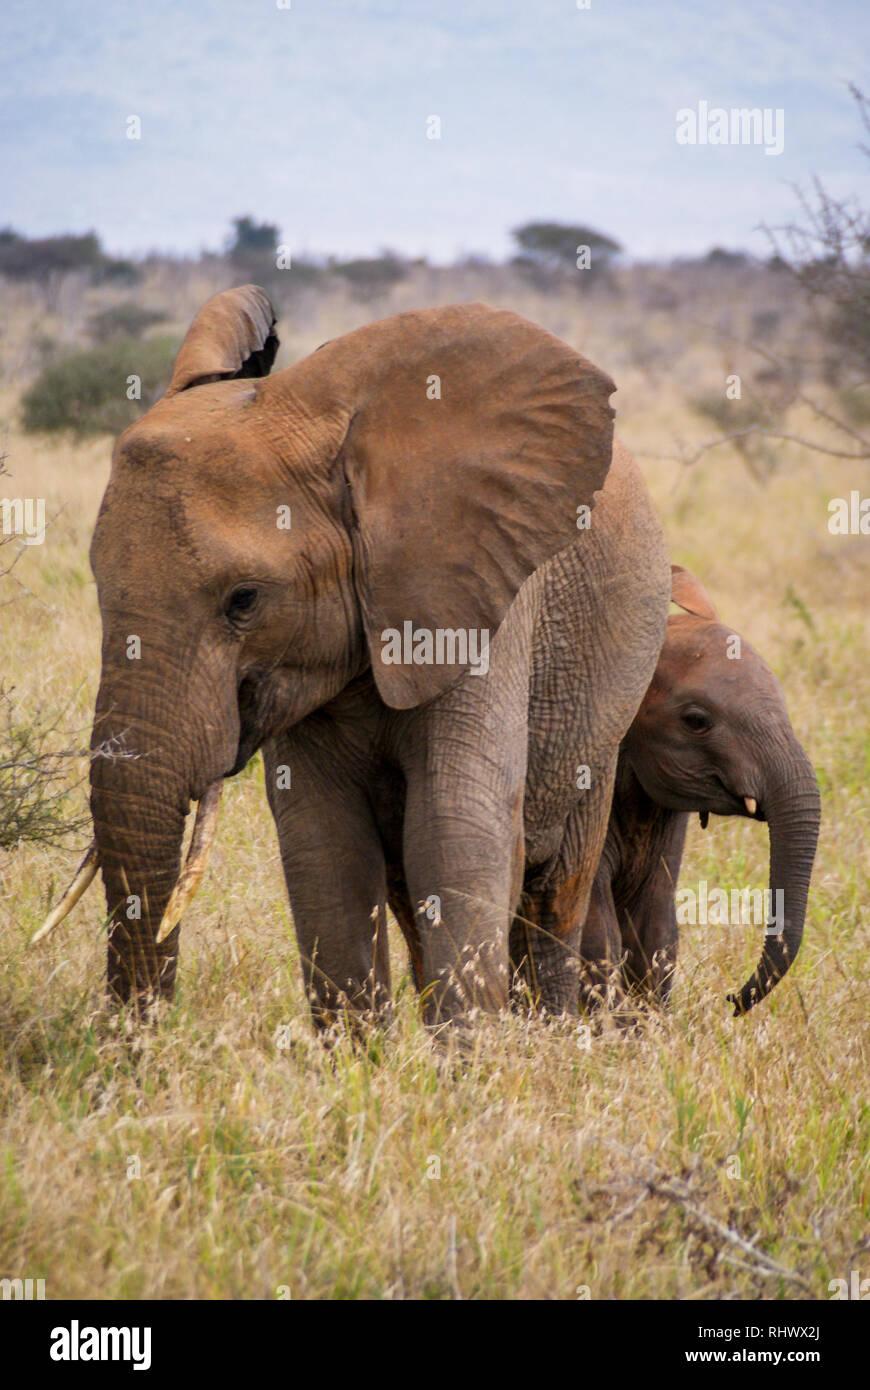 double elephant in Tsavo National Park - Stock Image